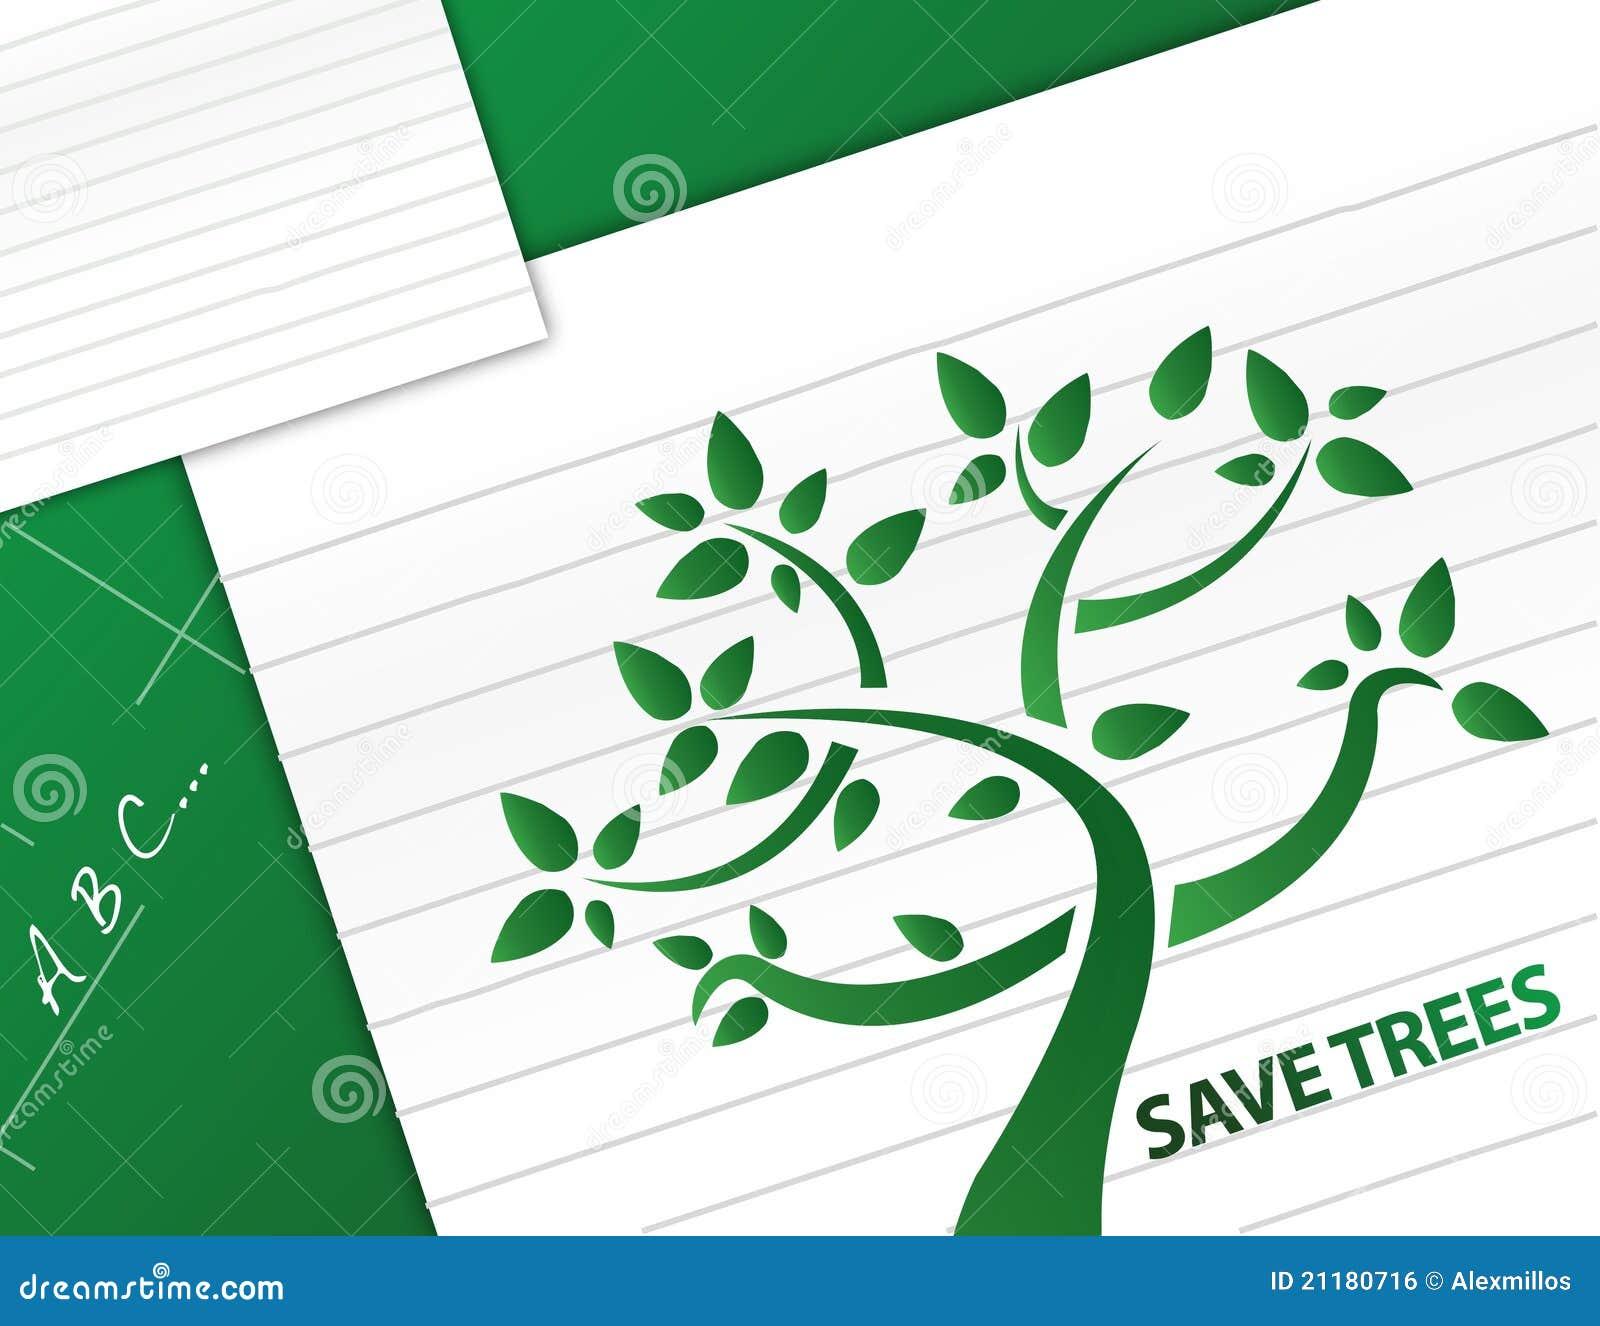 Save trees illustration design